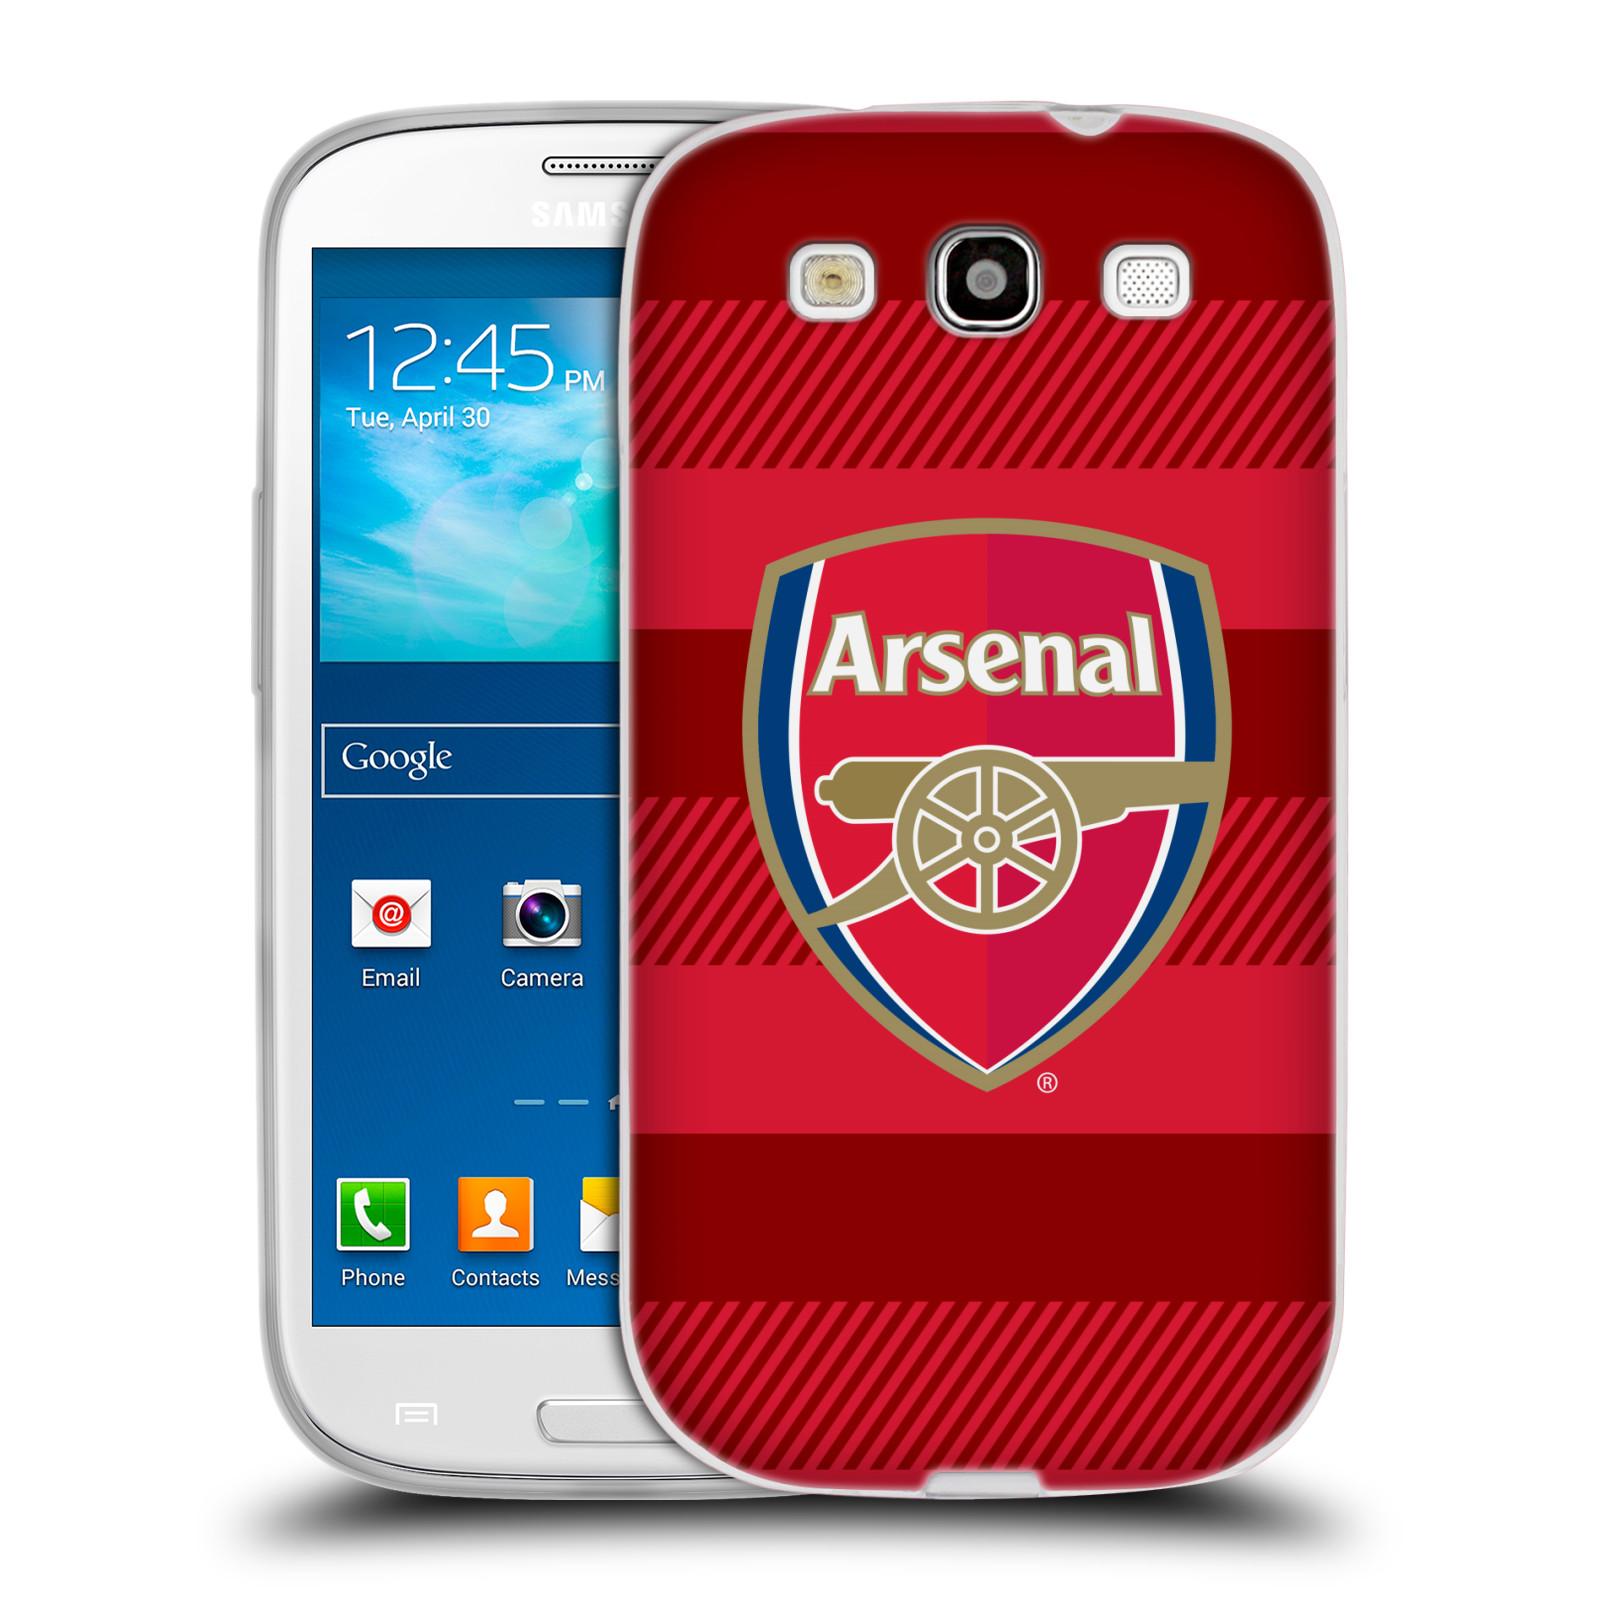 Silikonové pouzdro na mobil Samsung Galaxy S3 Neo - Head Case - Arsenal FC - Logo s pruhy